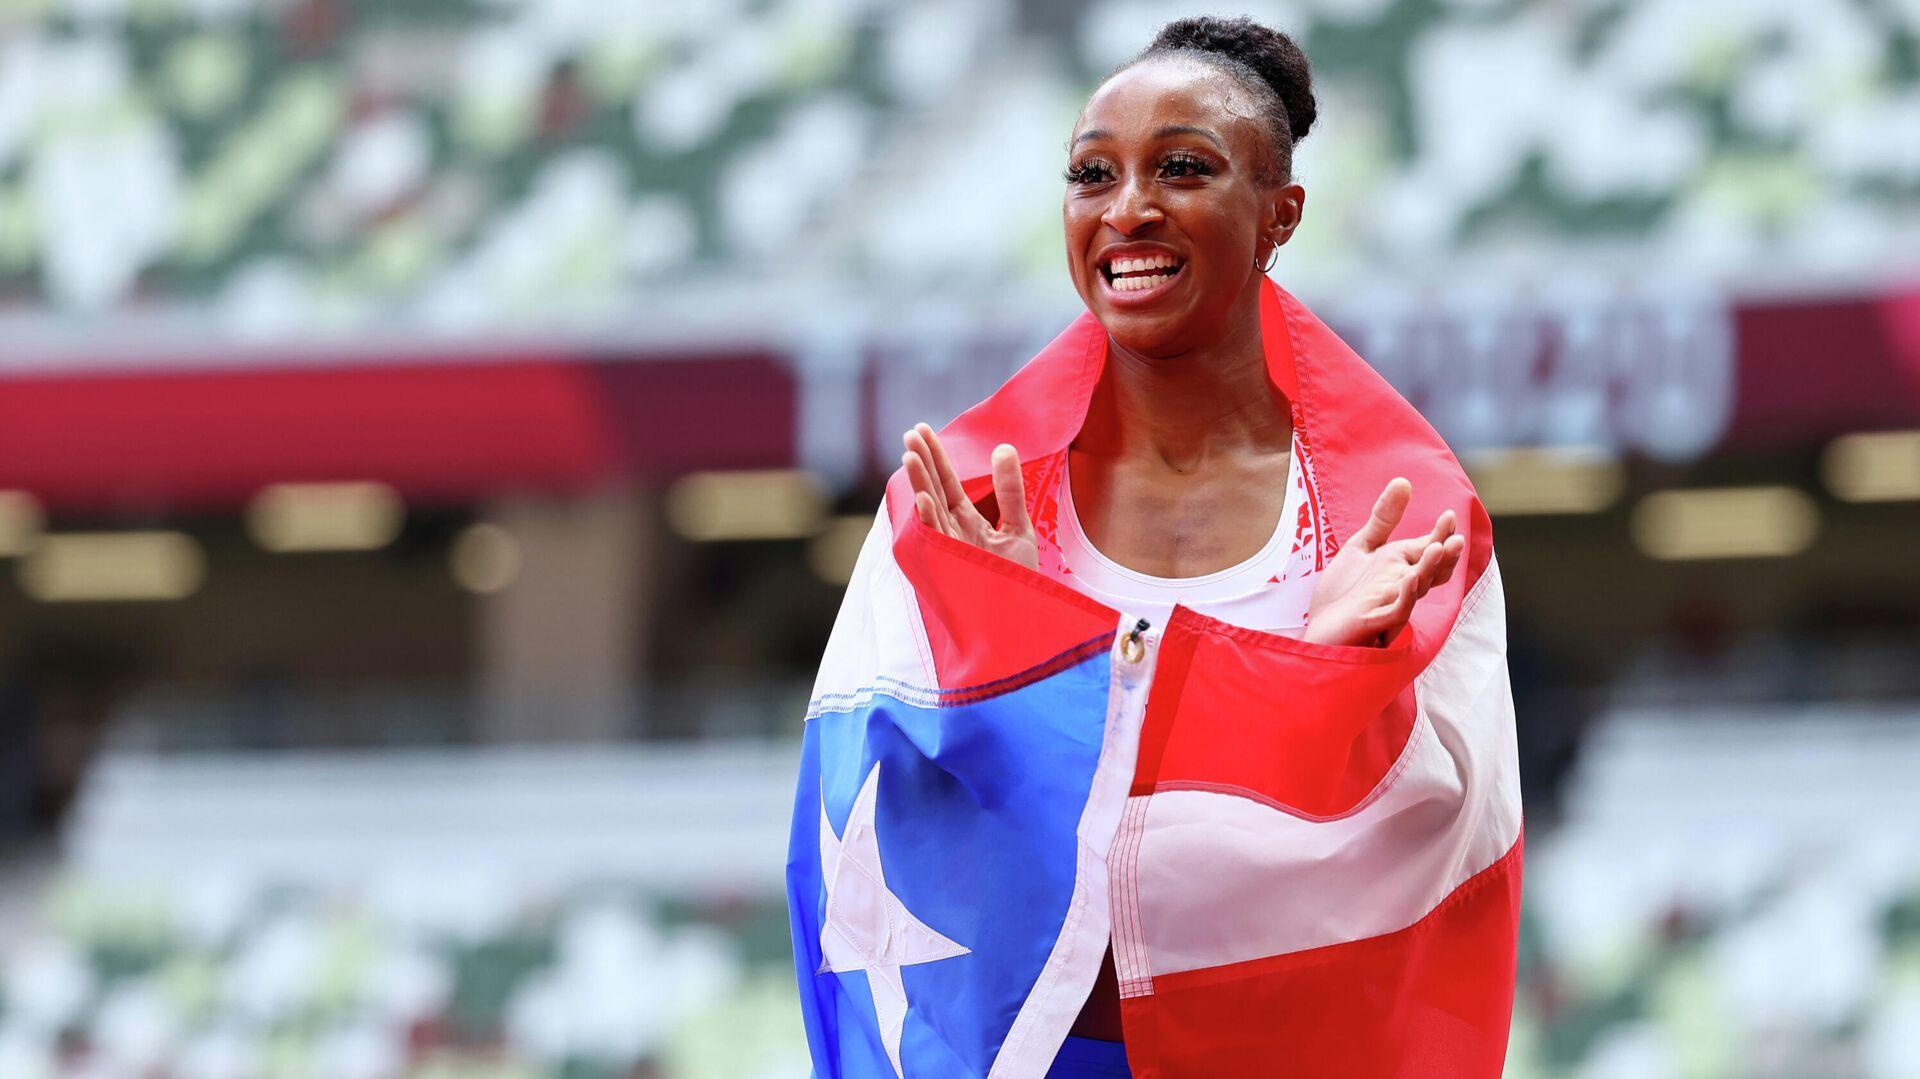 Jasmine Camacho-Quinn, velocista puertorriqueña - Sputnik Mundo, 1920, 02.08.2021